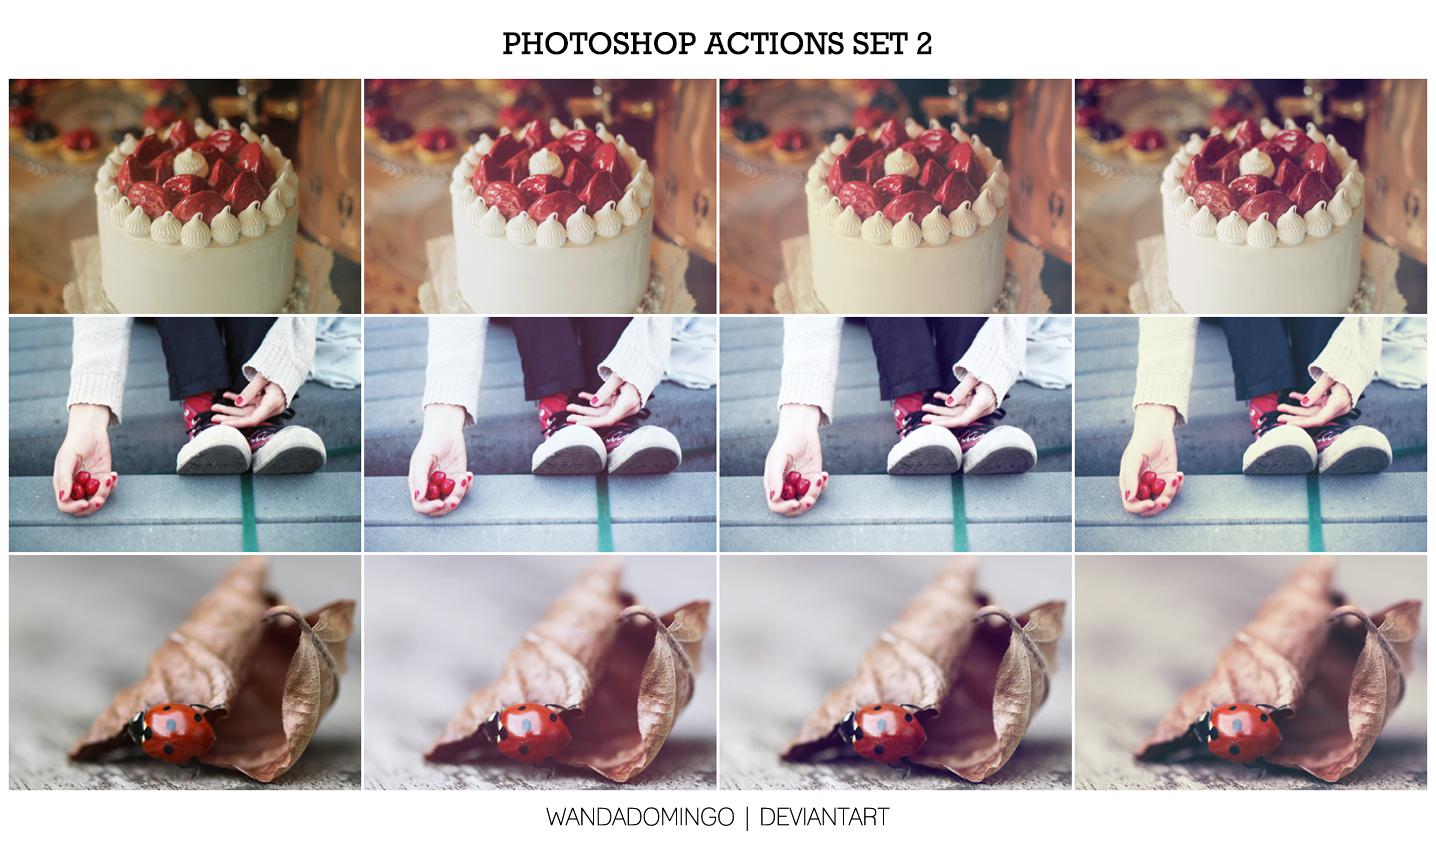 Photoshop Actions Set 2 by wandadomingo